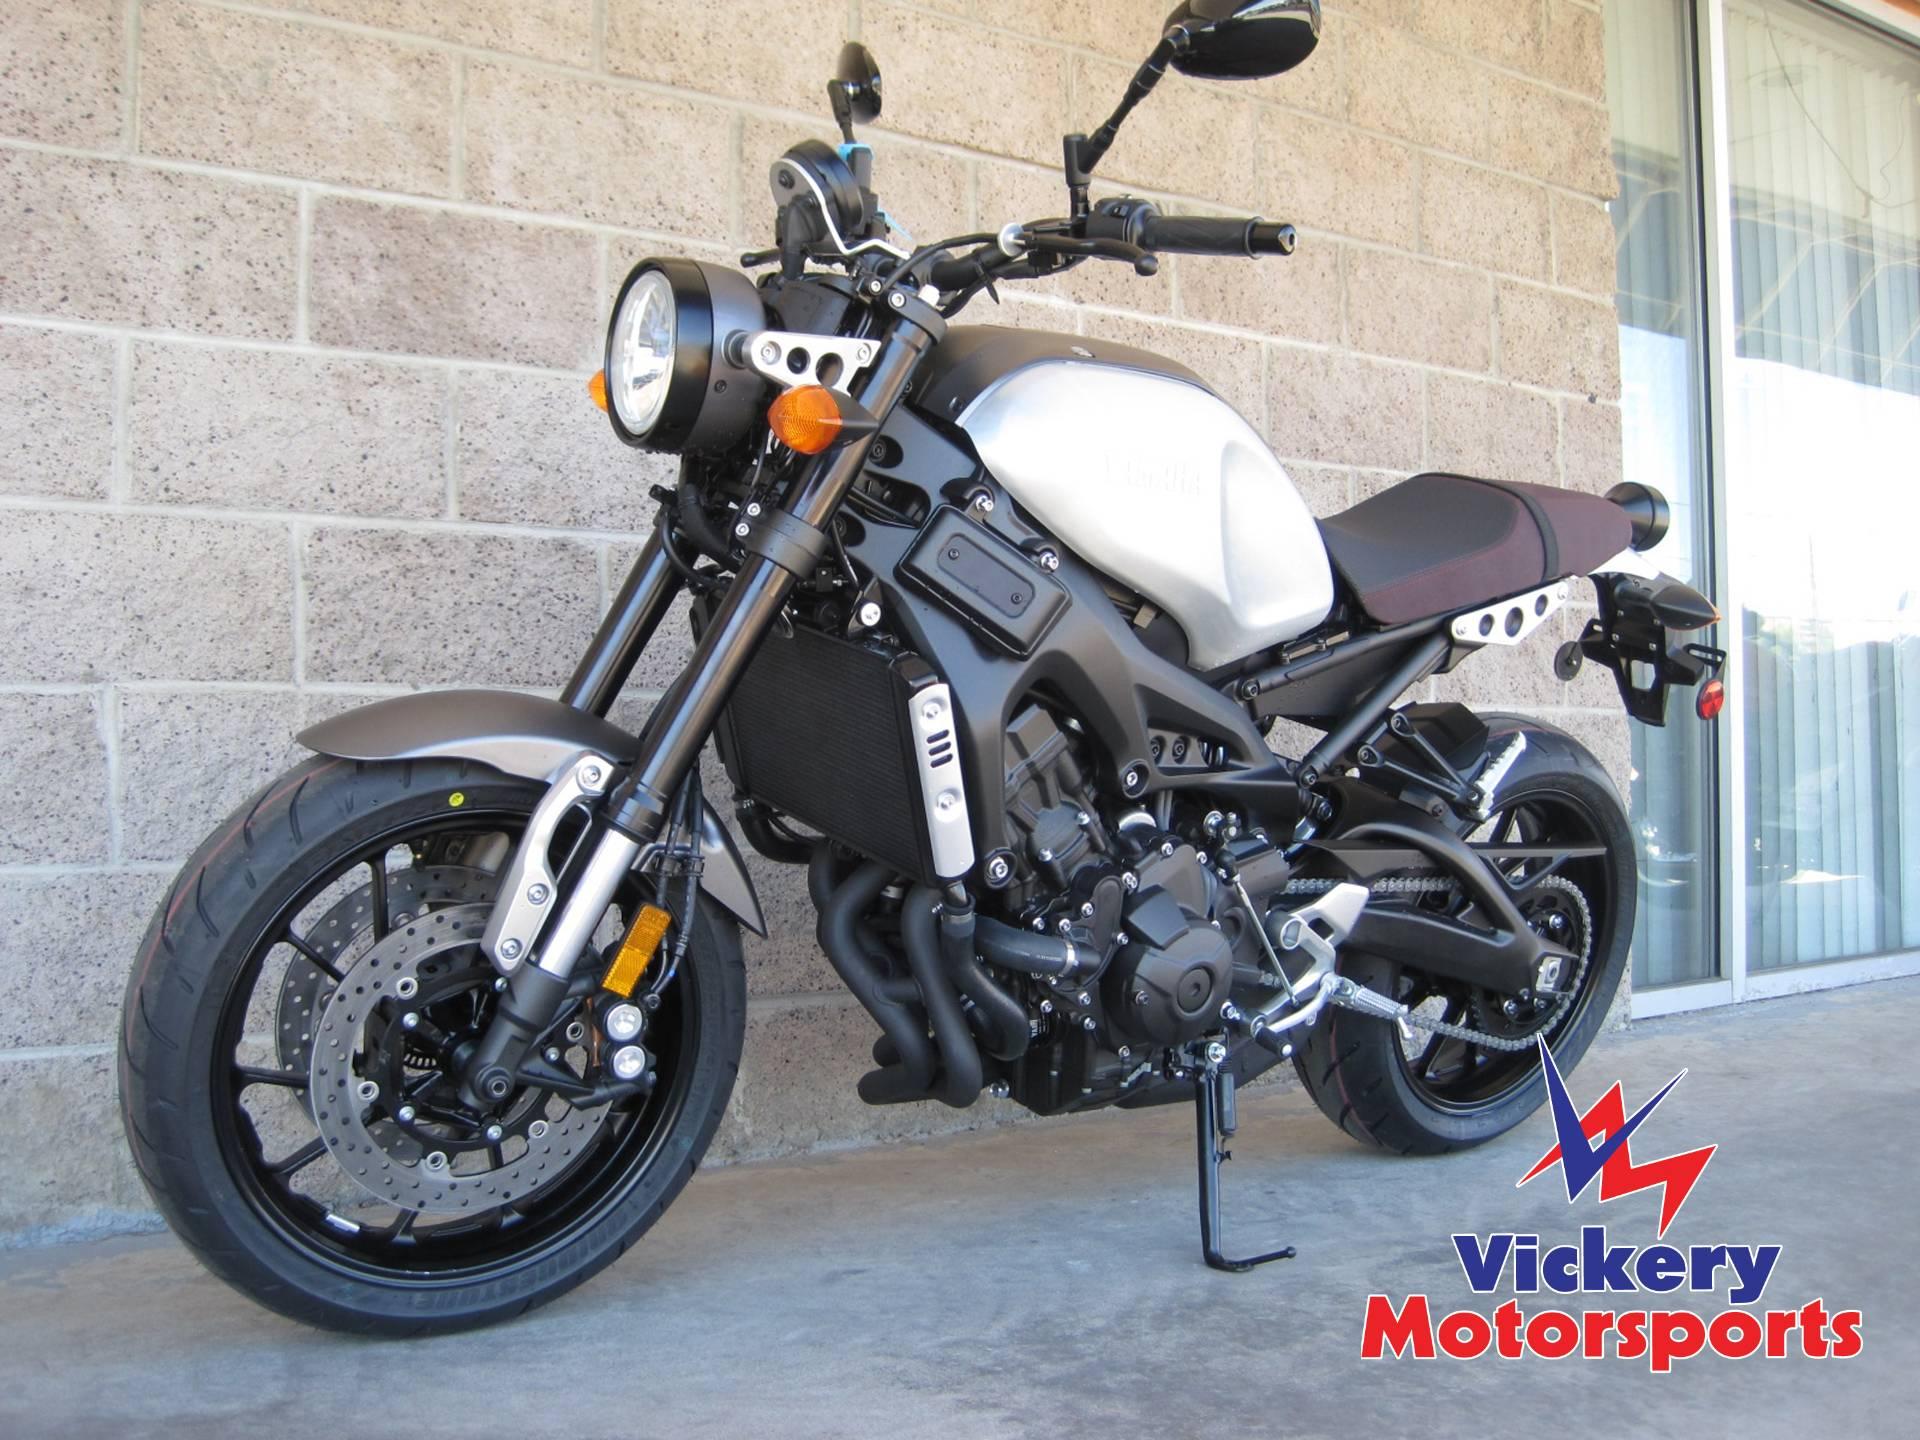 2016 Yamaha Xsr900 In Denver Colorado